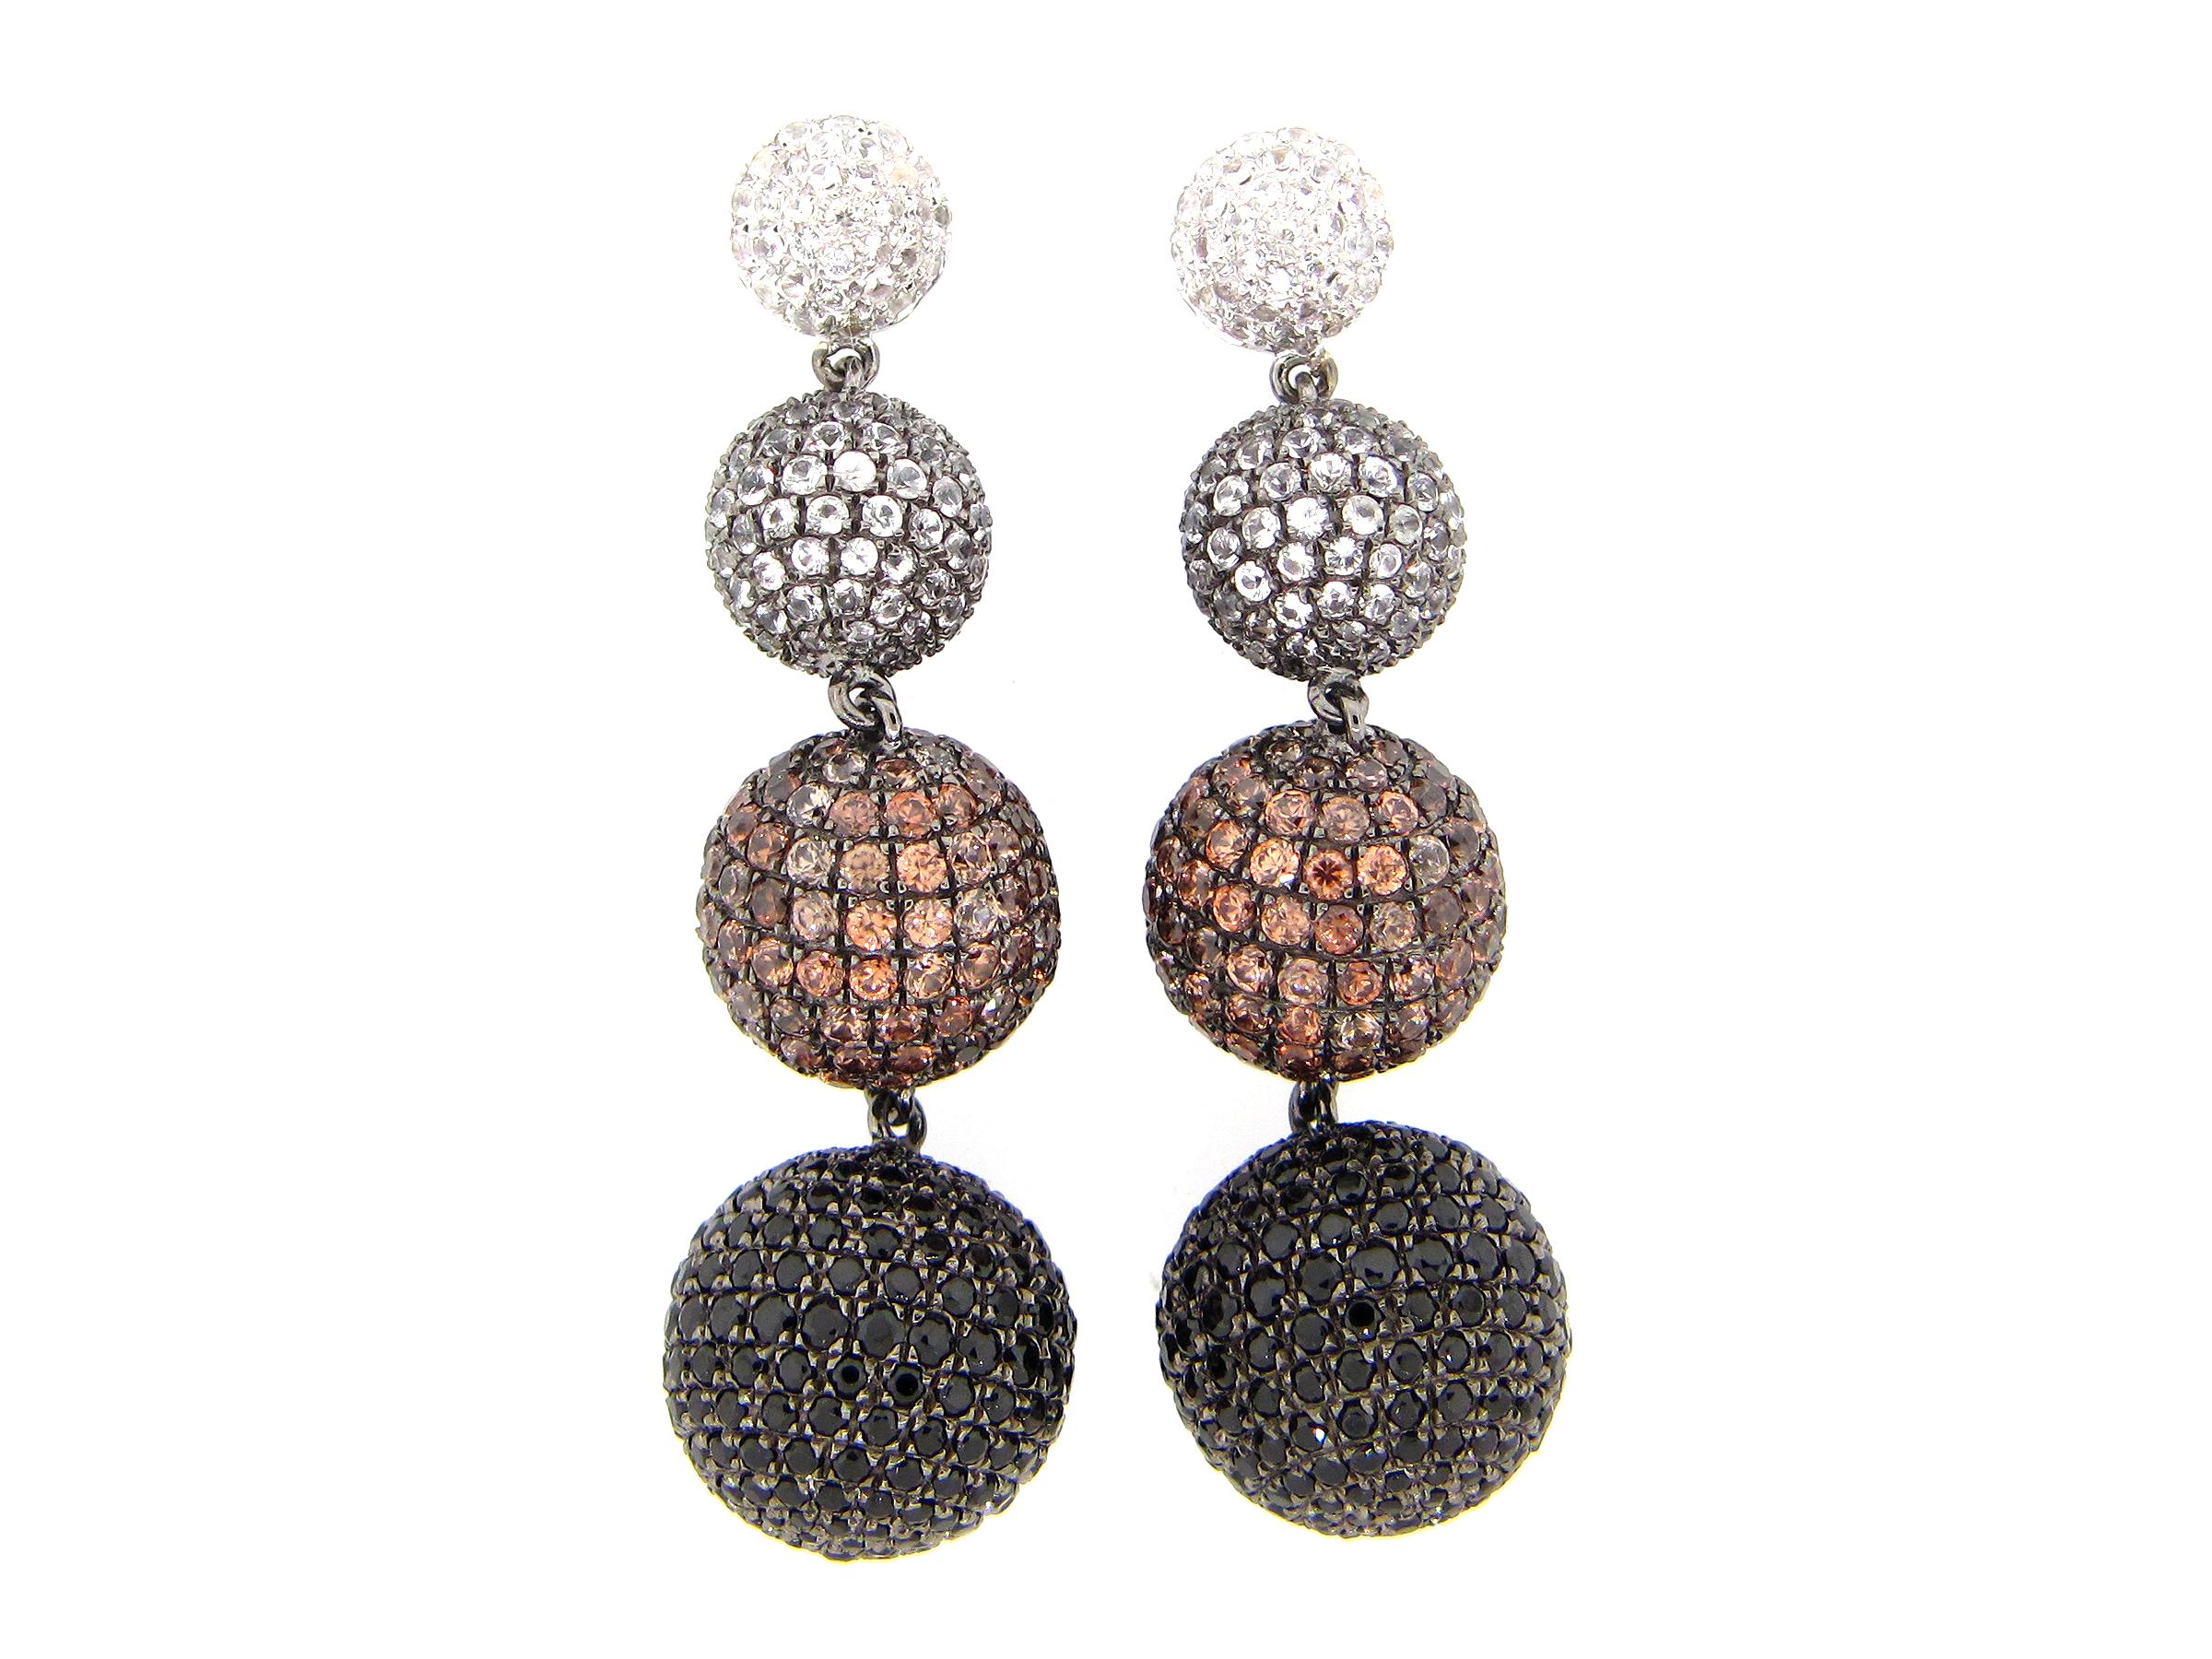 Mixed Gem Ball Earrings